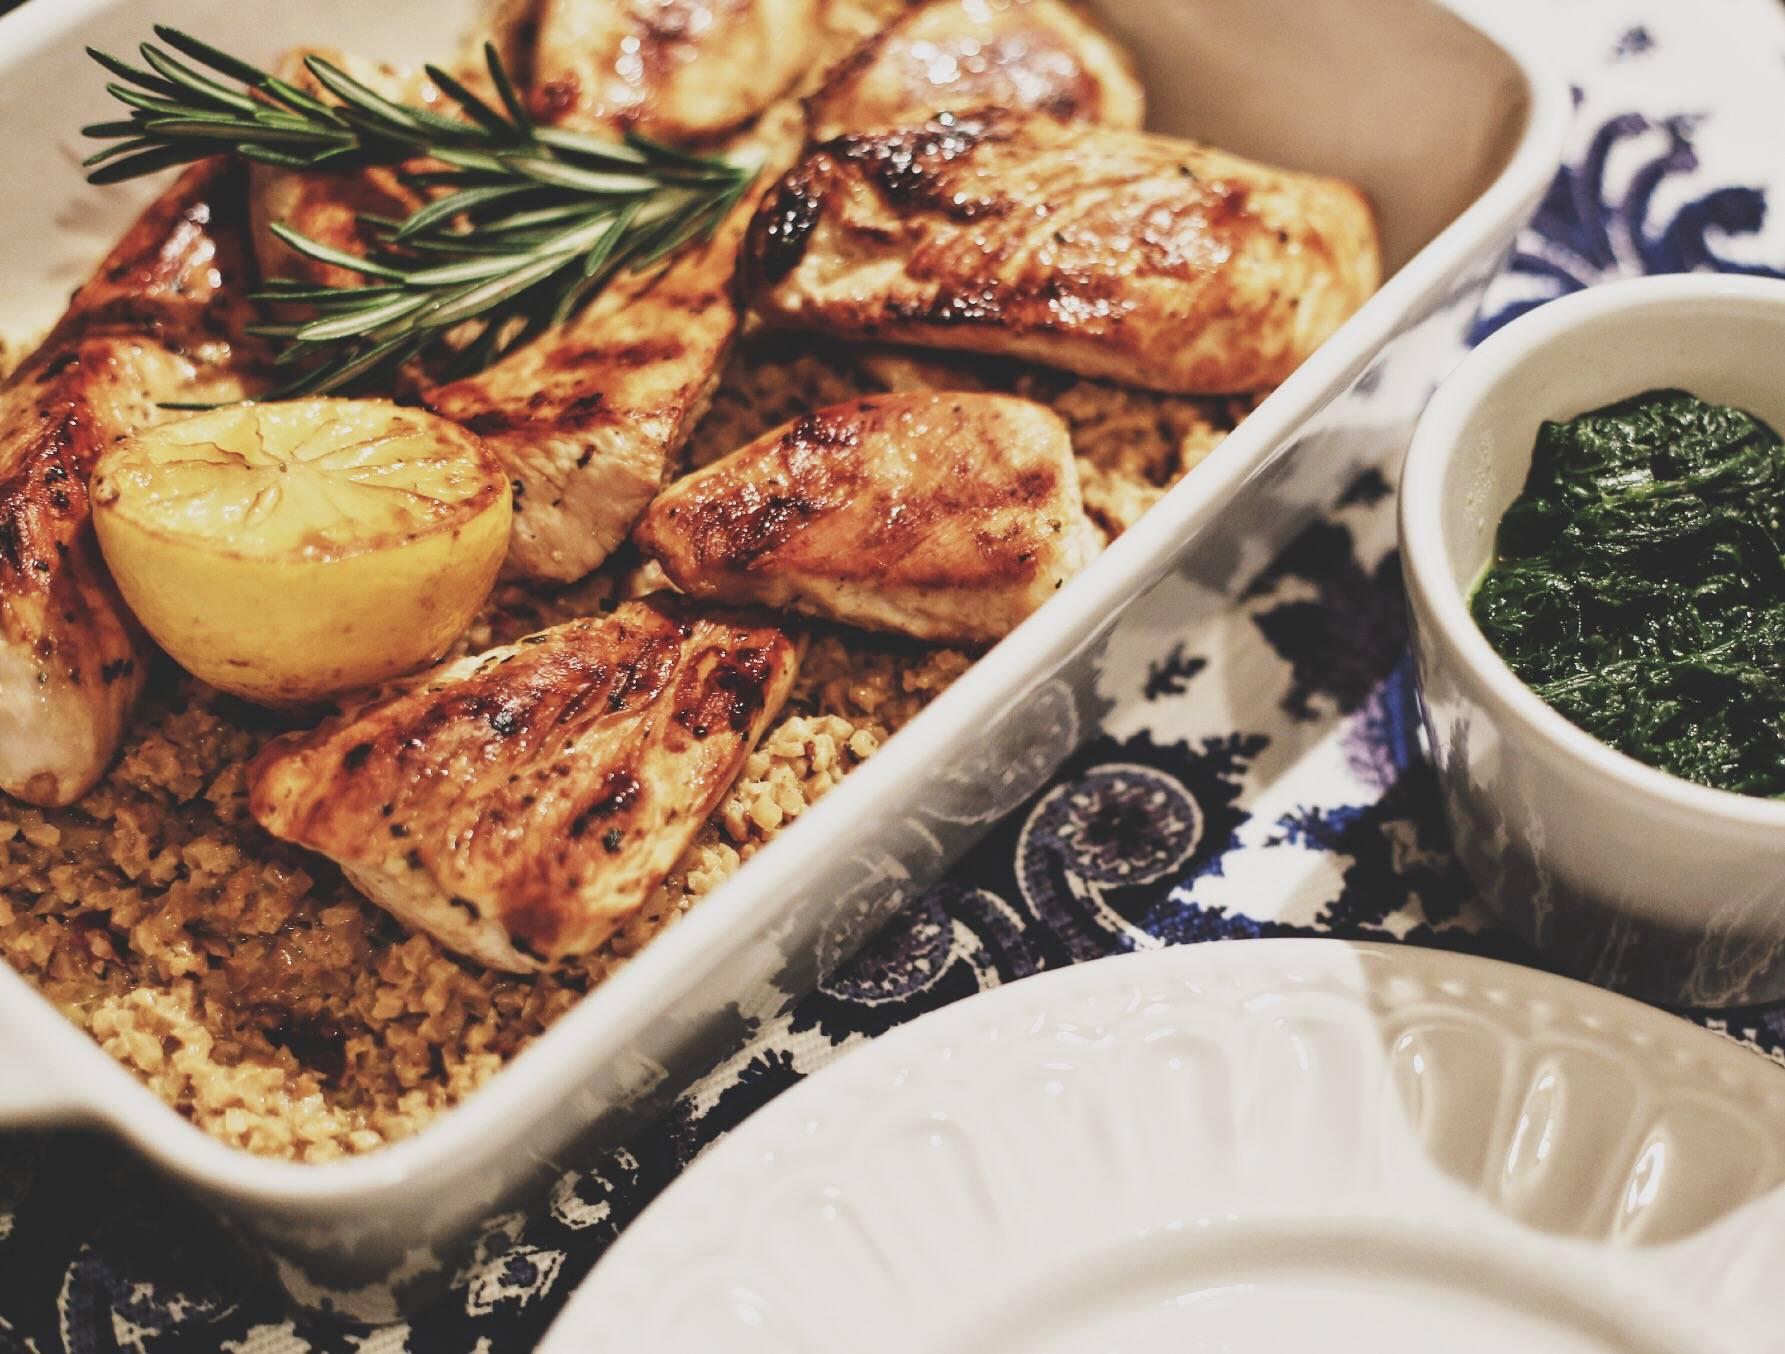 Eat healthy with Cauli Rice